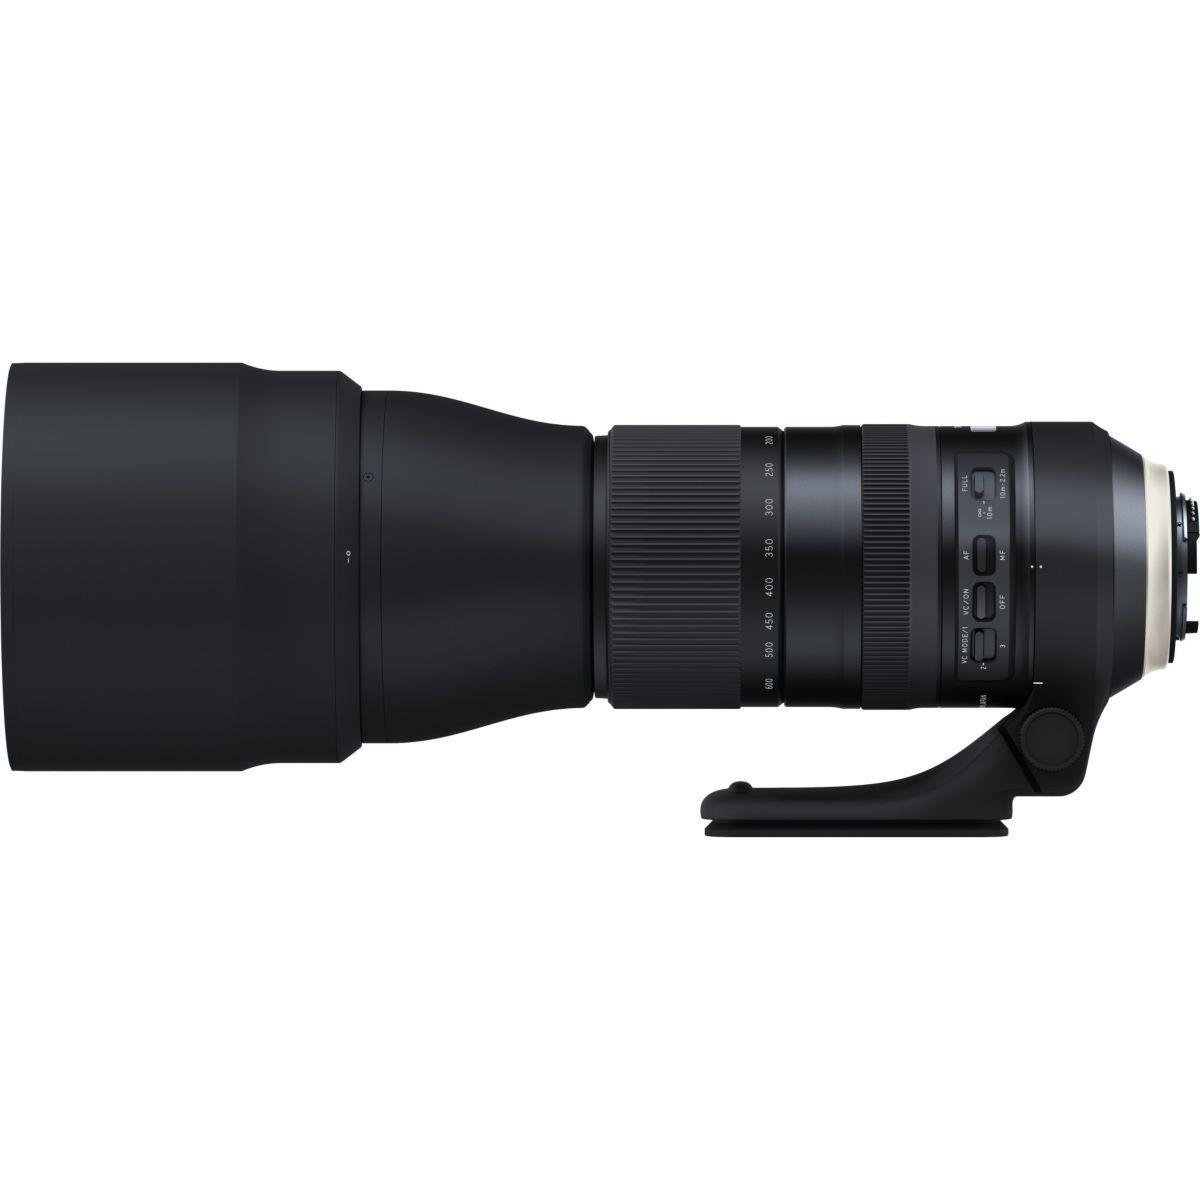 Objectif pour reflex tamron sp 150-600mm f/5-6,3 di vc usd g2 ...